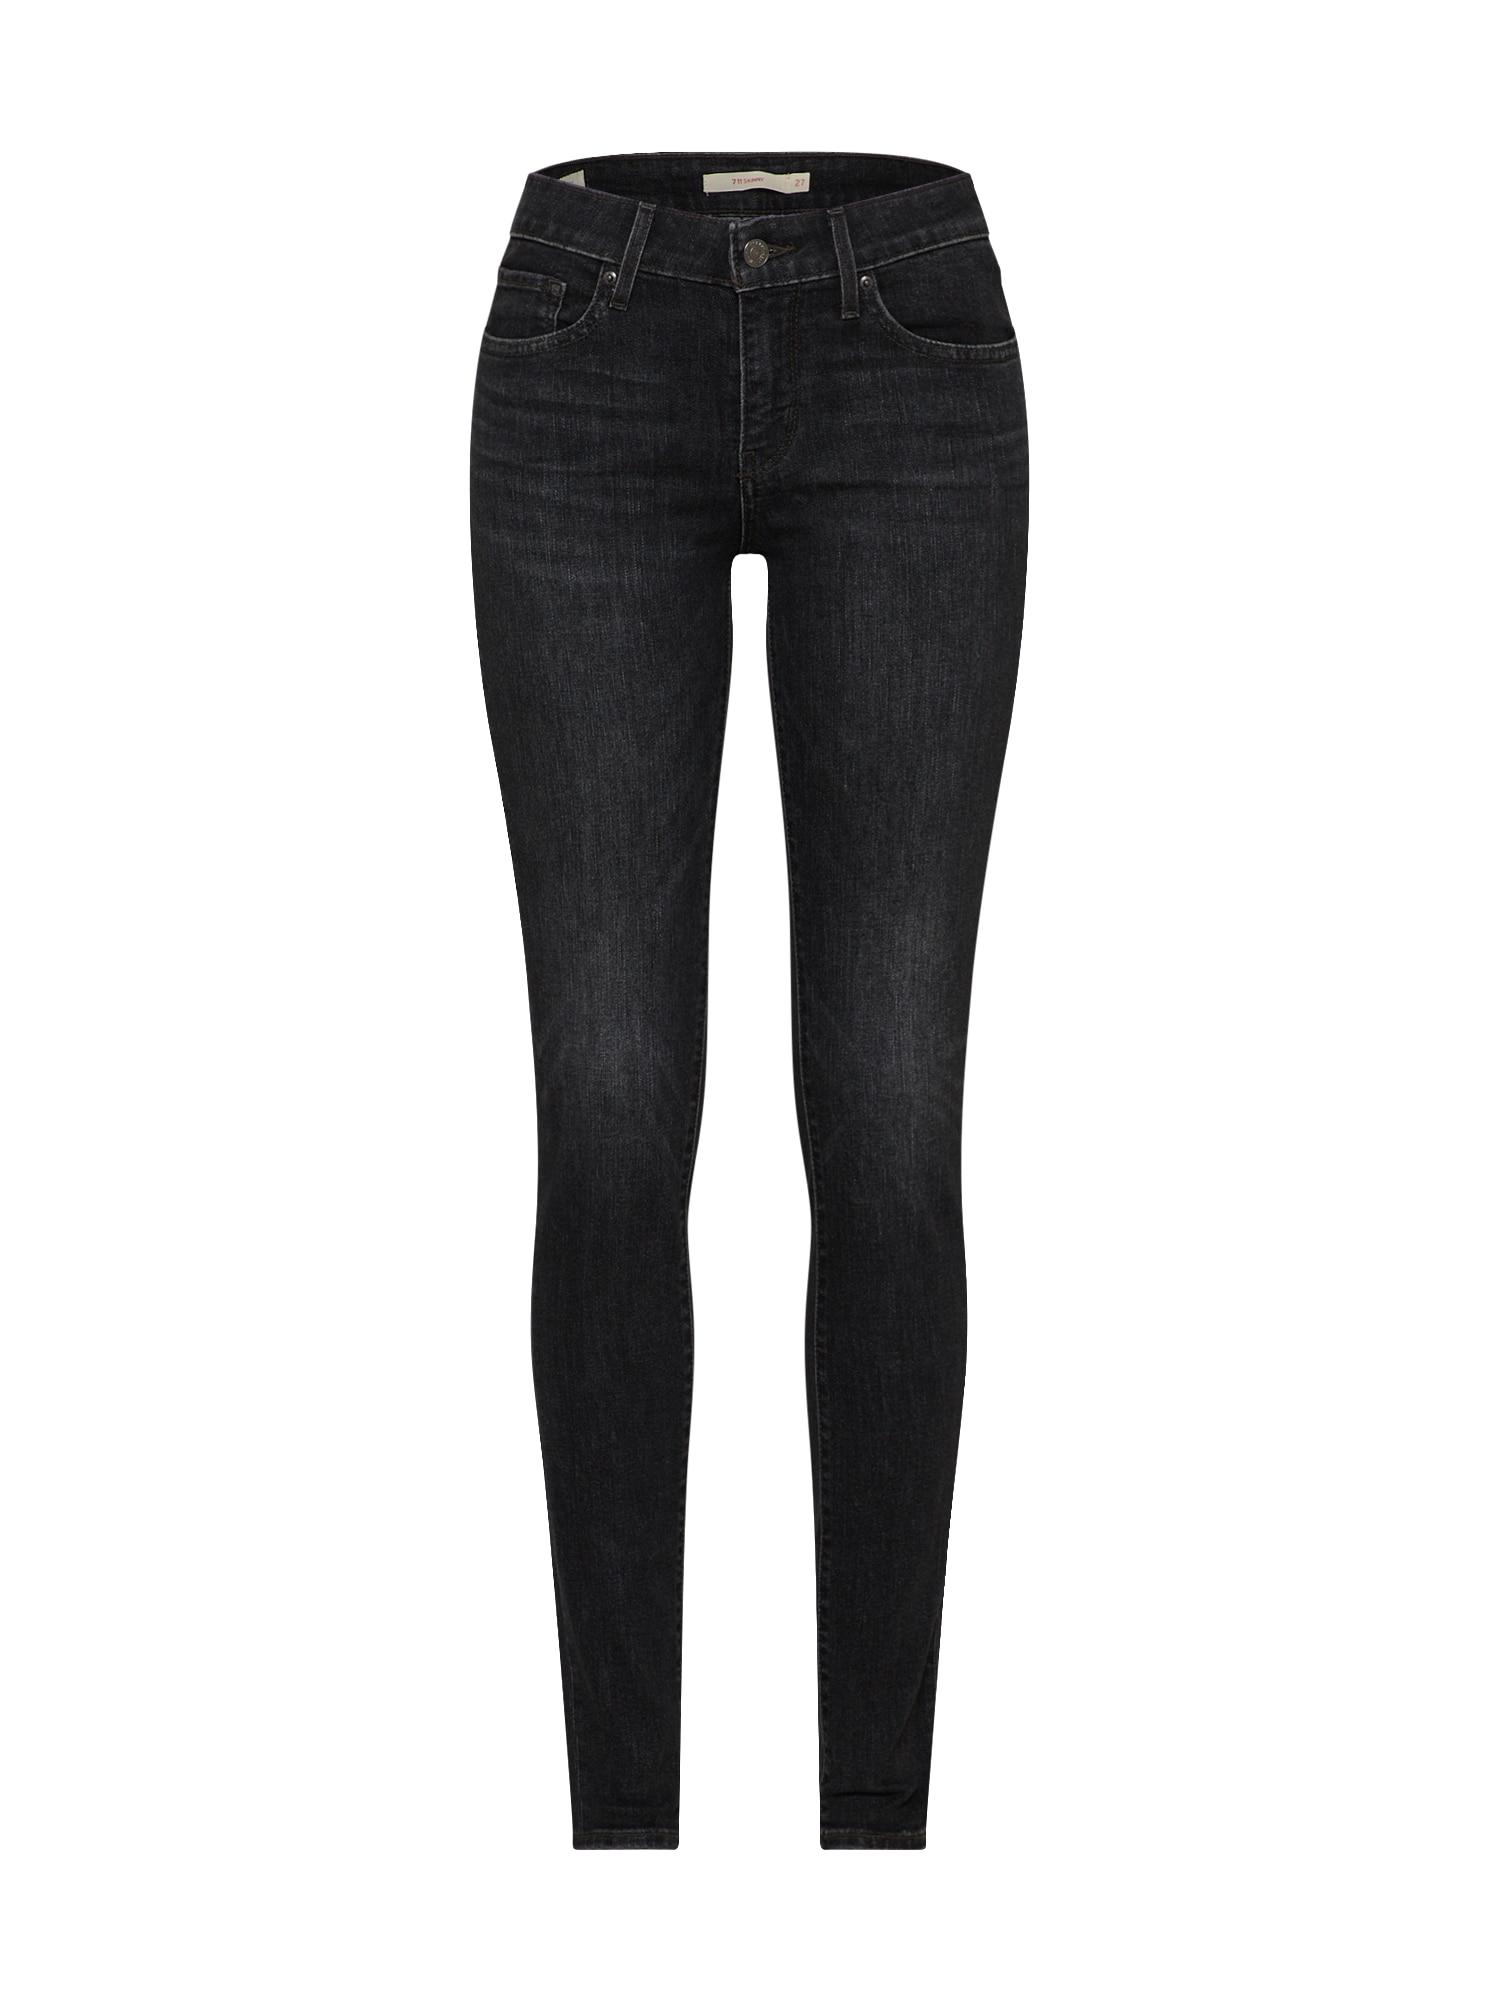 LEVI'S Dames Jeans 711 black denim